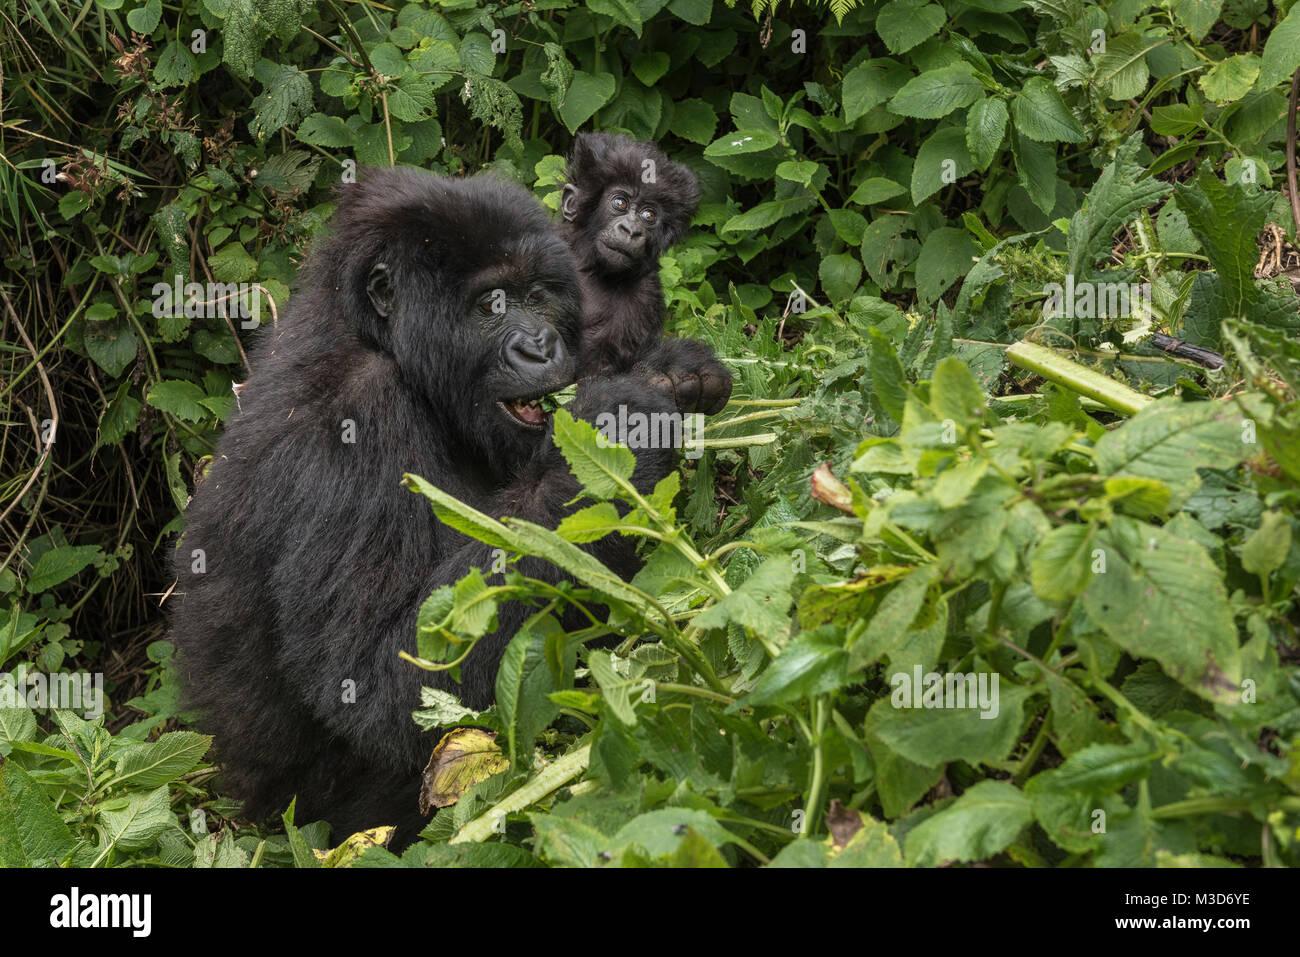 Mother and baby mountain gorilla, Sabyinyo Group, Rwanda - Stock Image